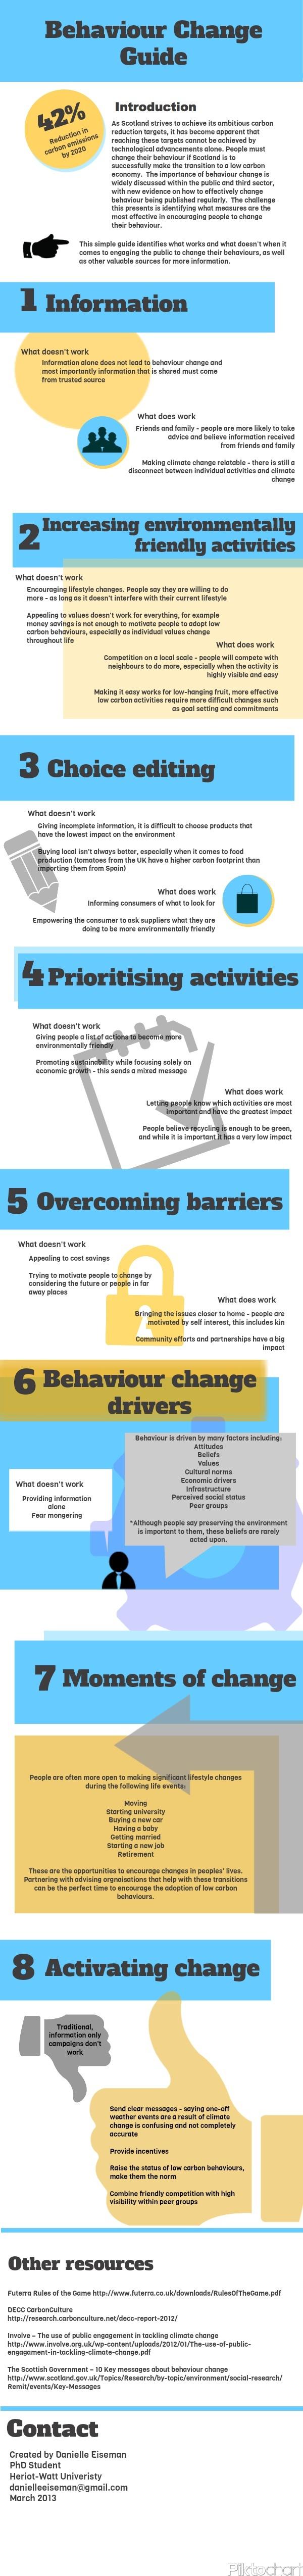 Behaviour change guide from Danielle Eiseman of Heriot Watt University, Edinburgh